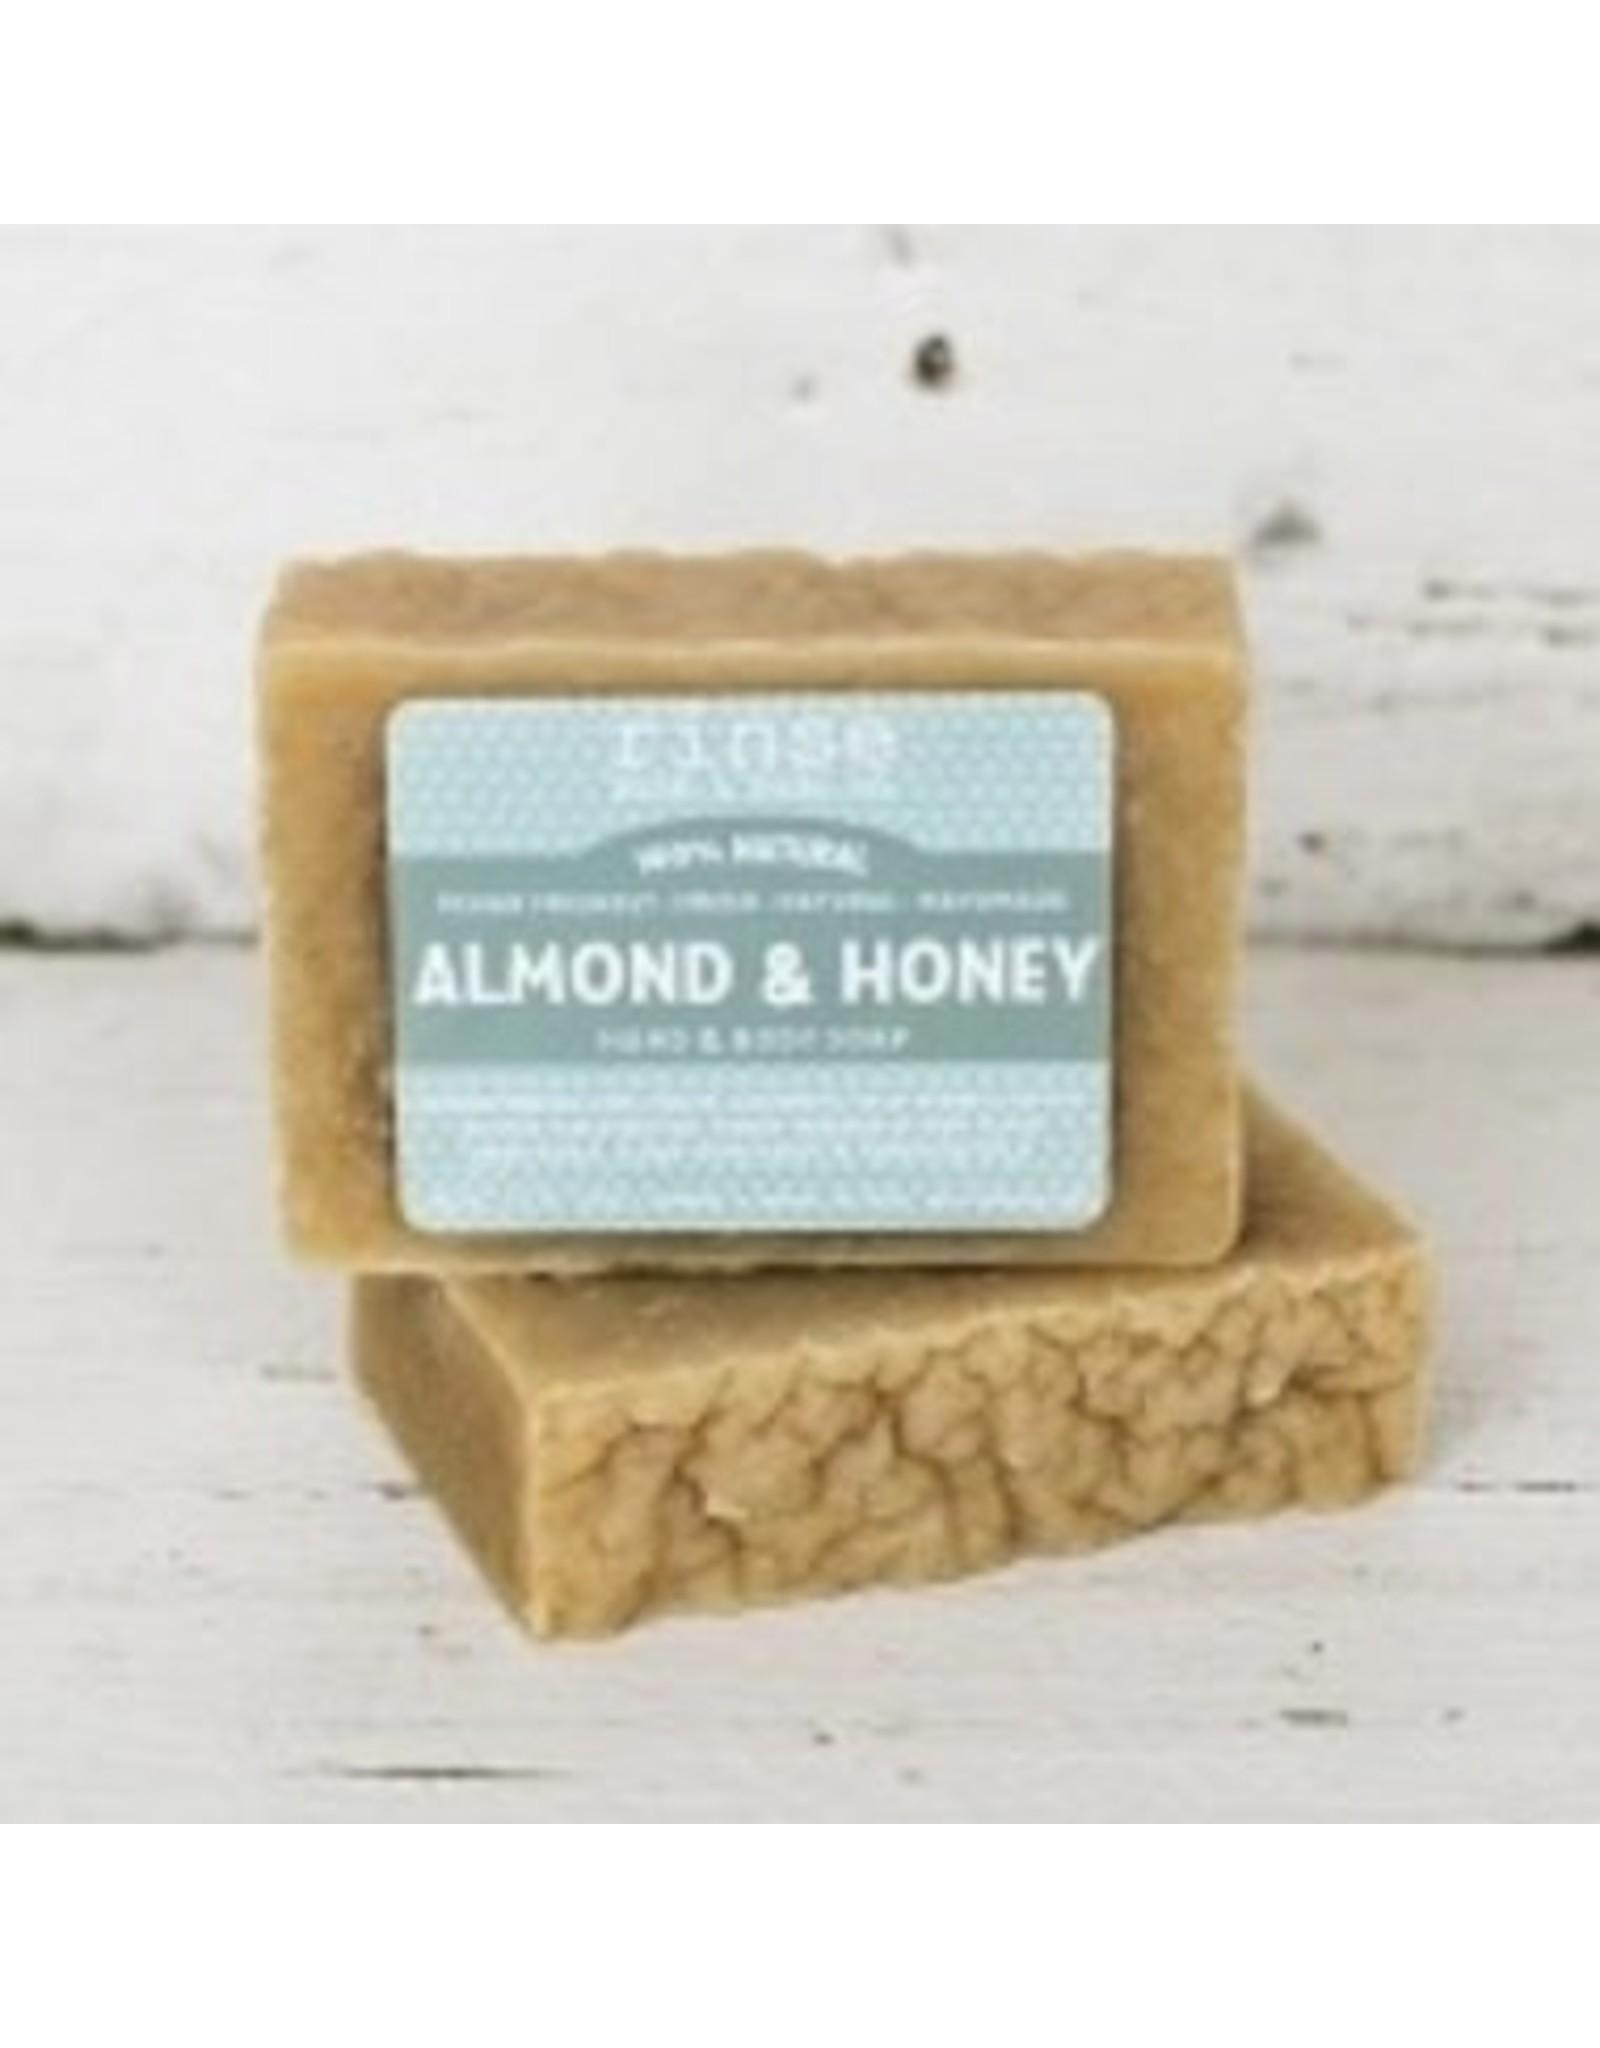 Rinse Bath & Body Co. Almond & Honey Soap 4.5oz